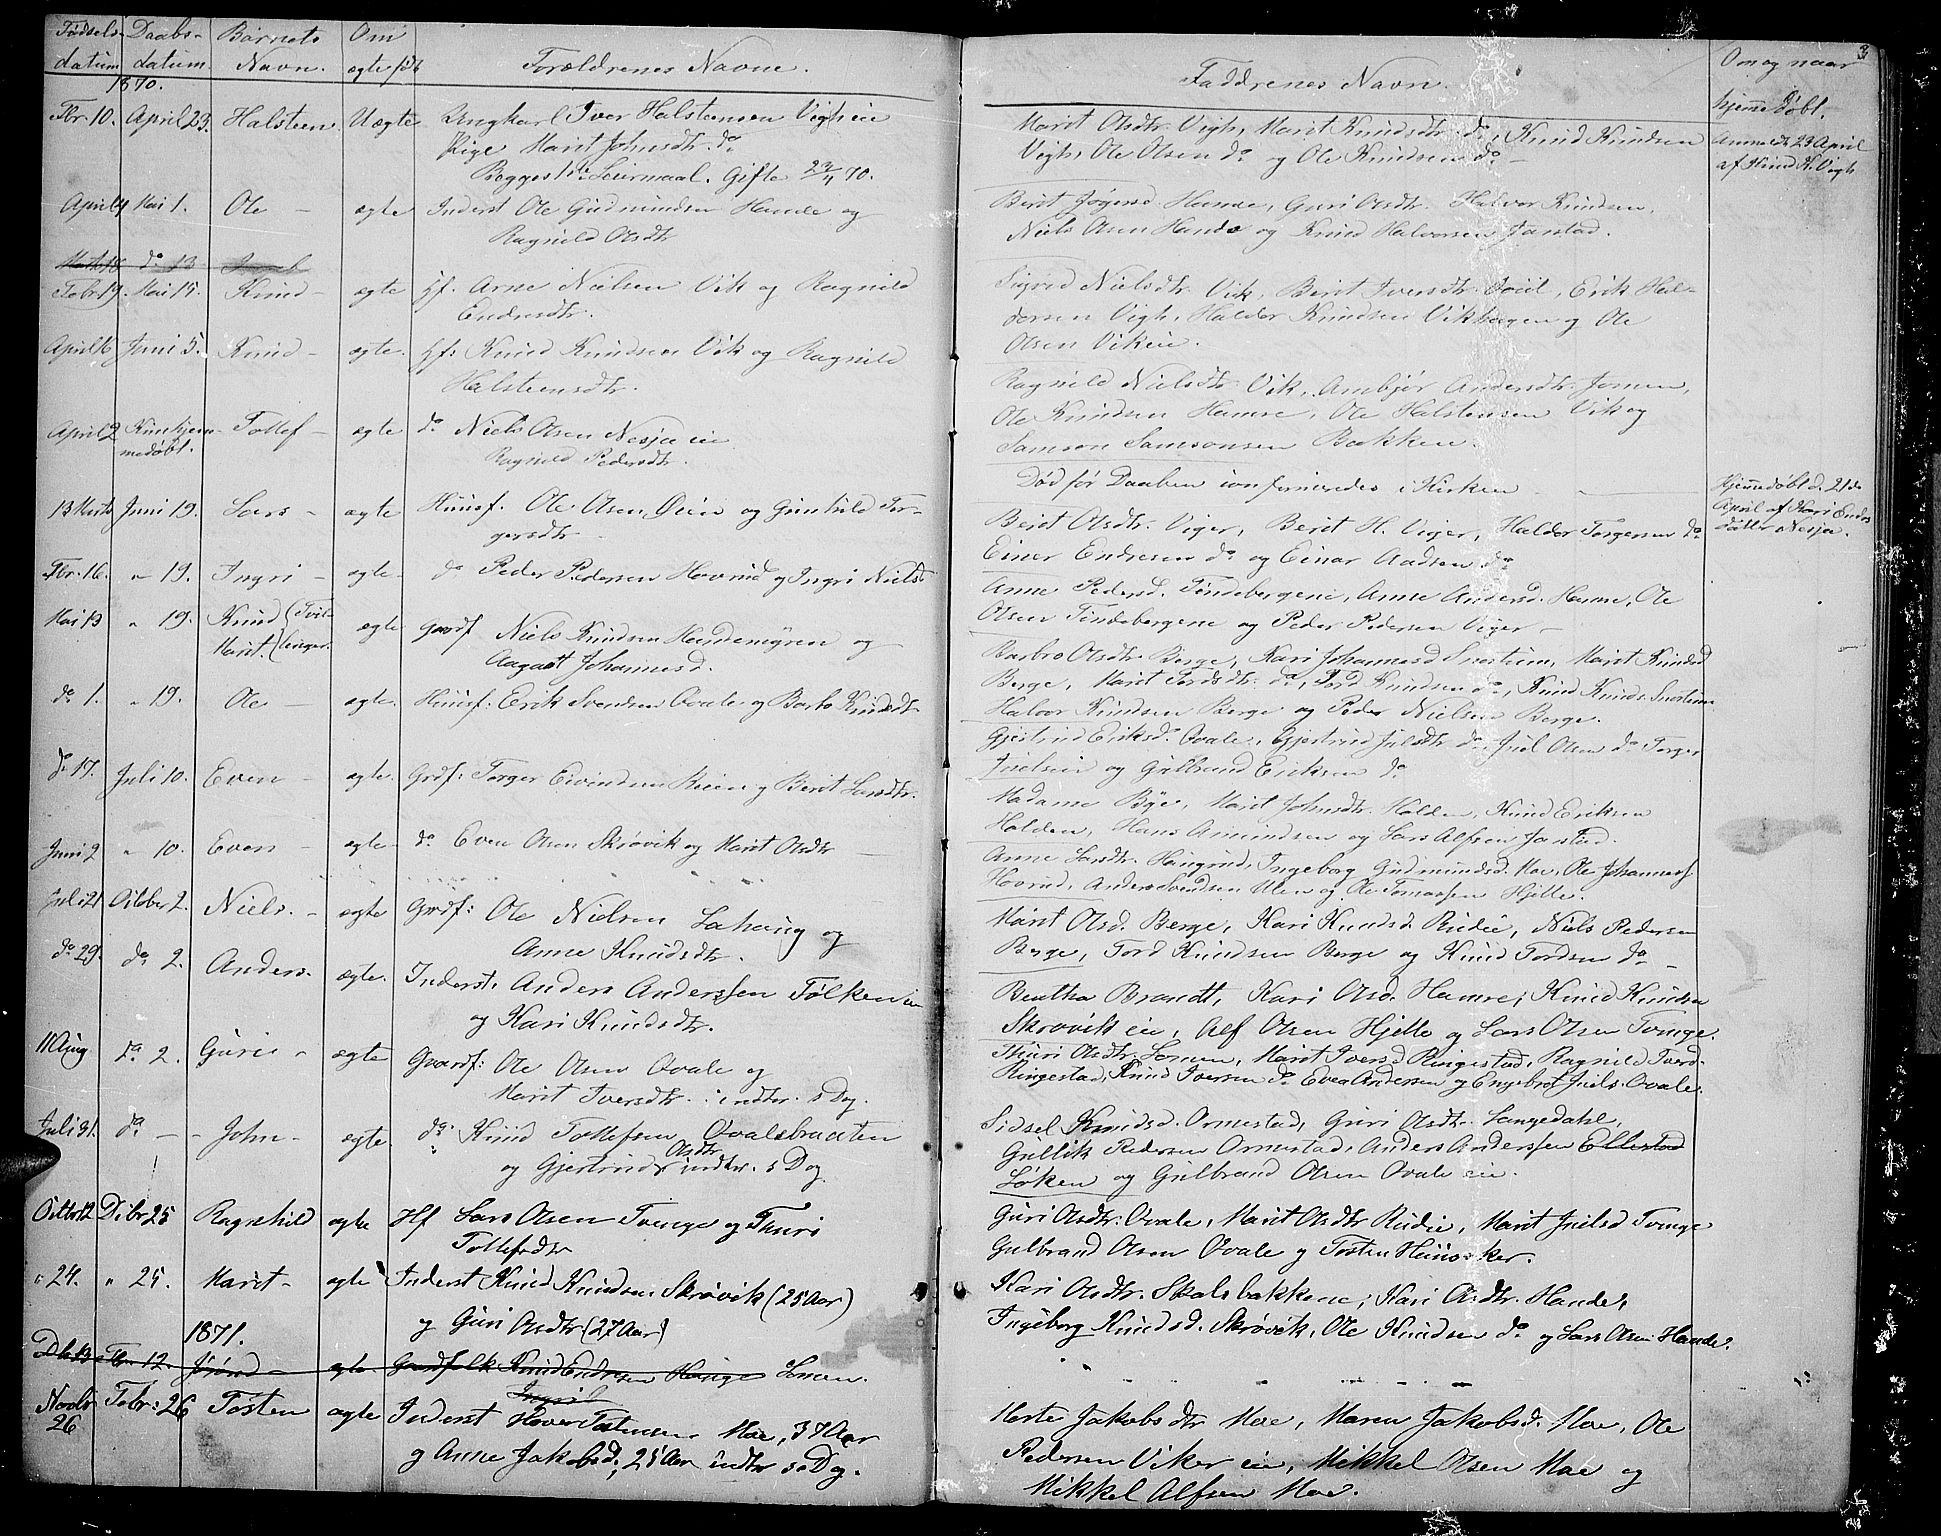 SAH, Vestre Slidre prestekontor, Klokkerbok nr. 1, 1869-1882, s. 3